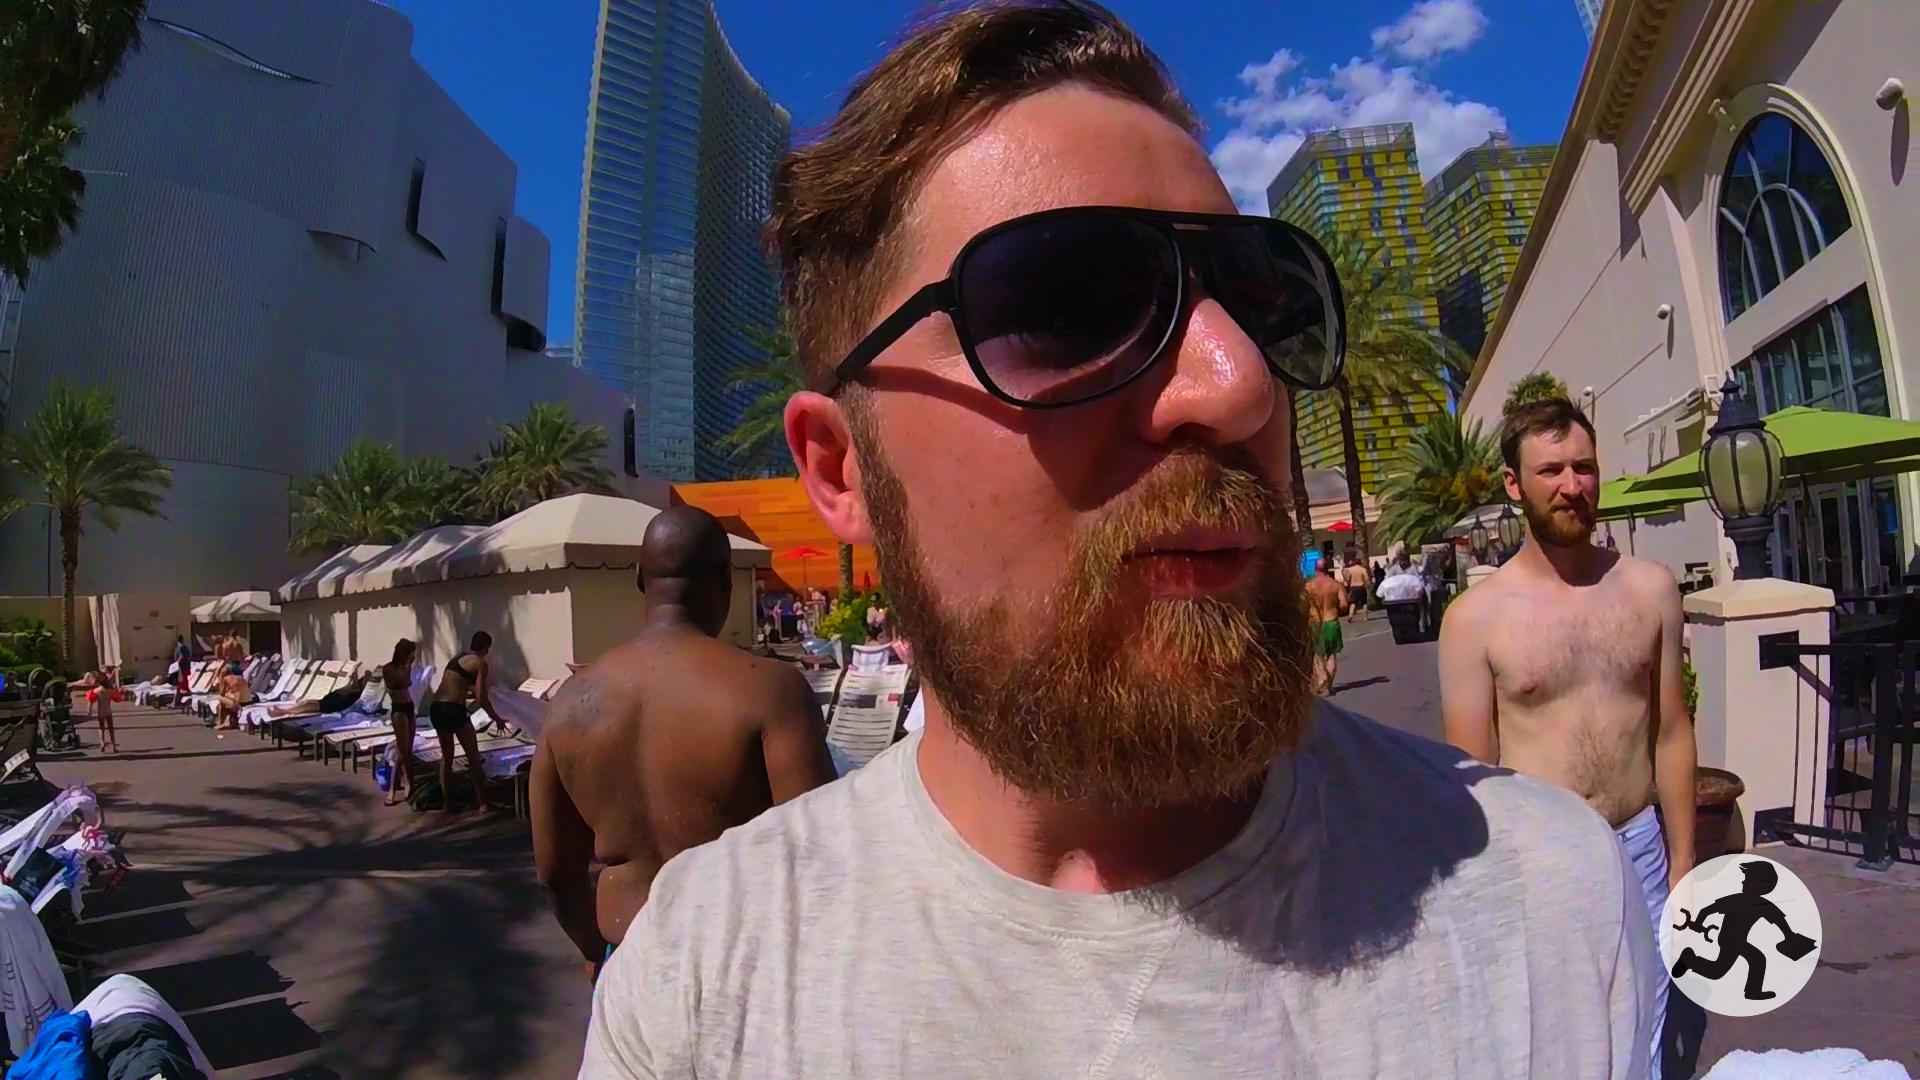 Vegas 2016 - No idea